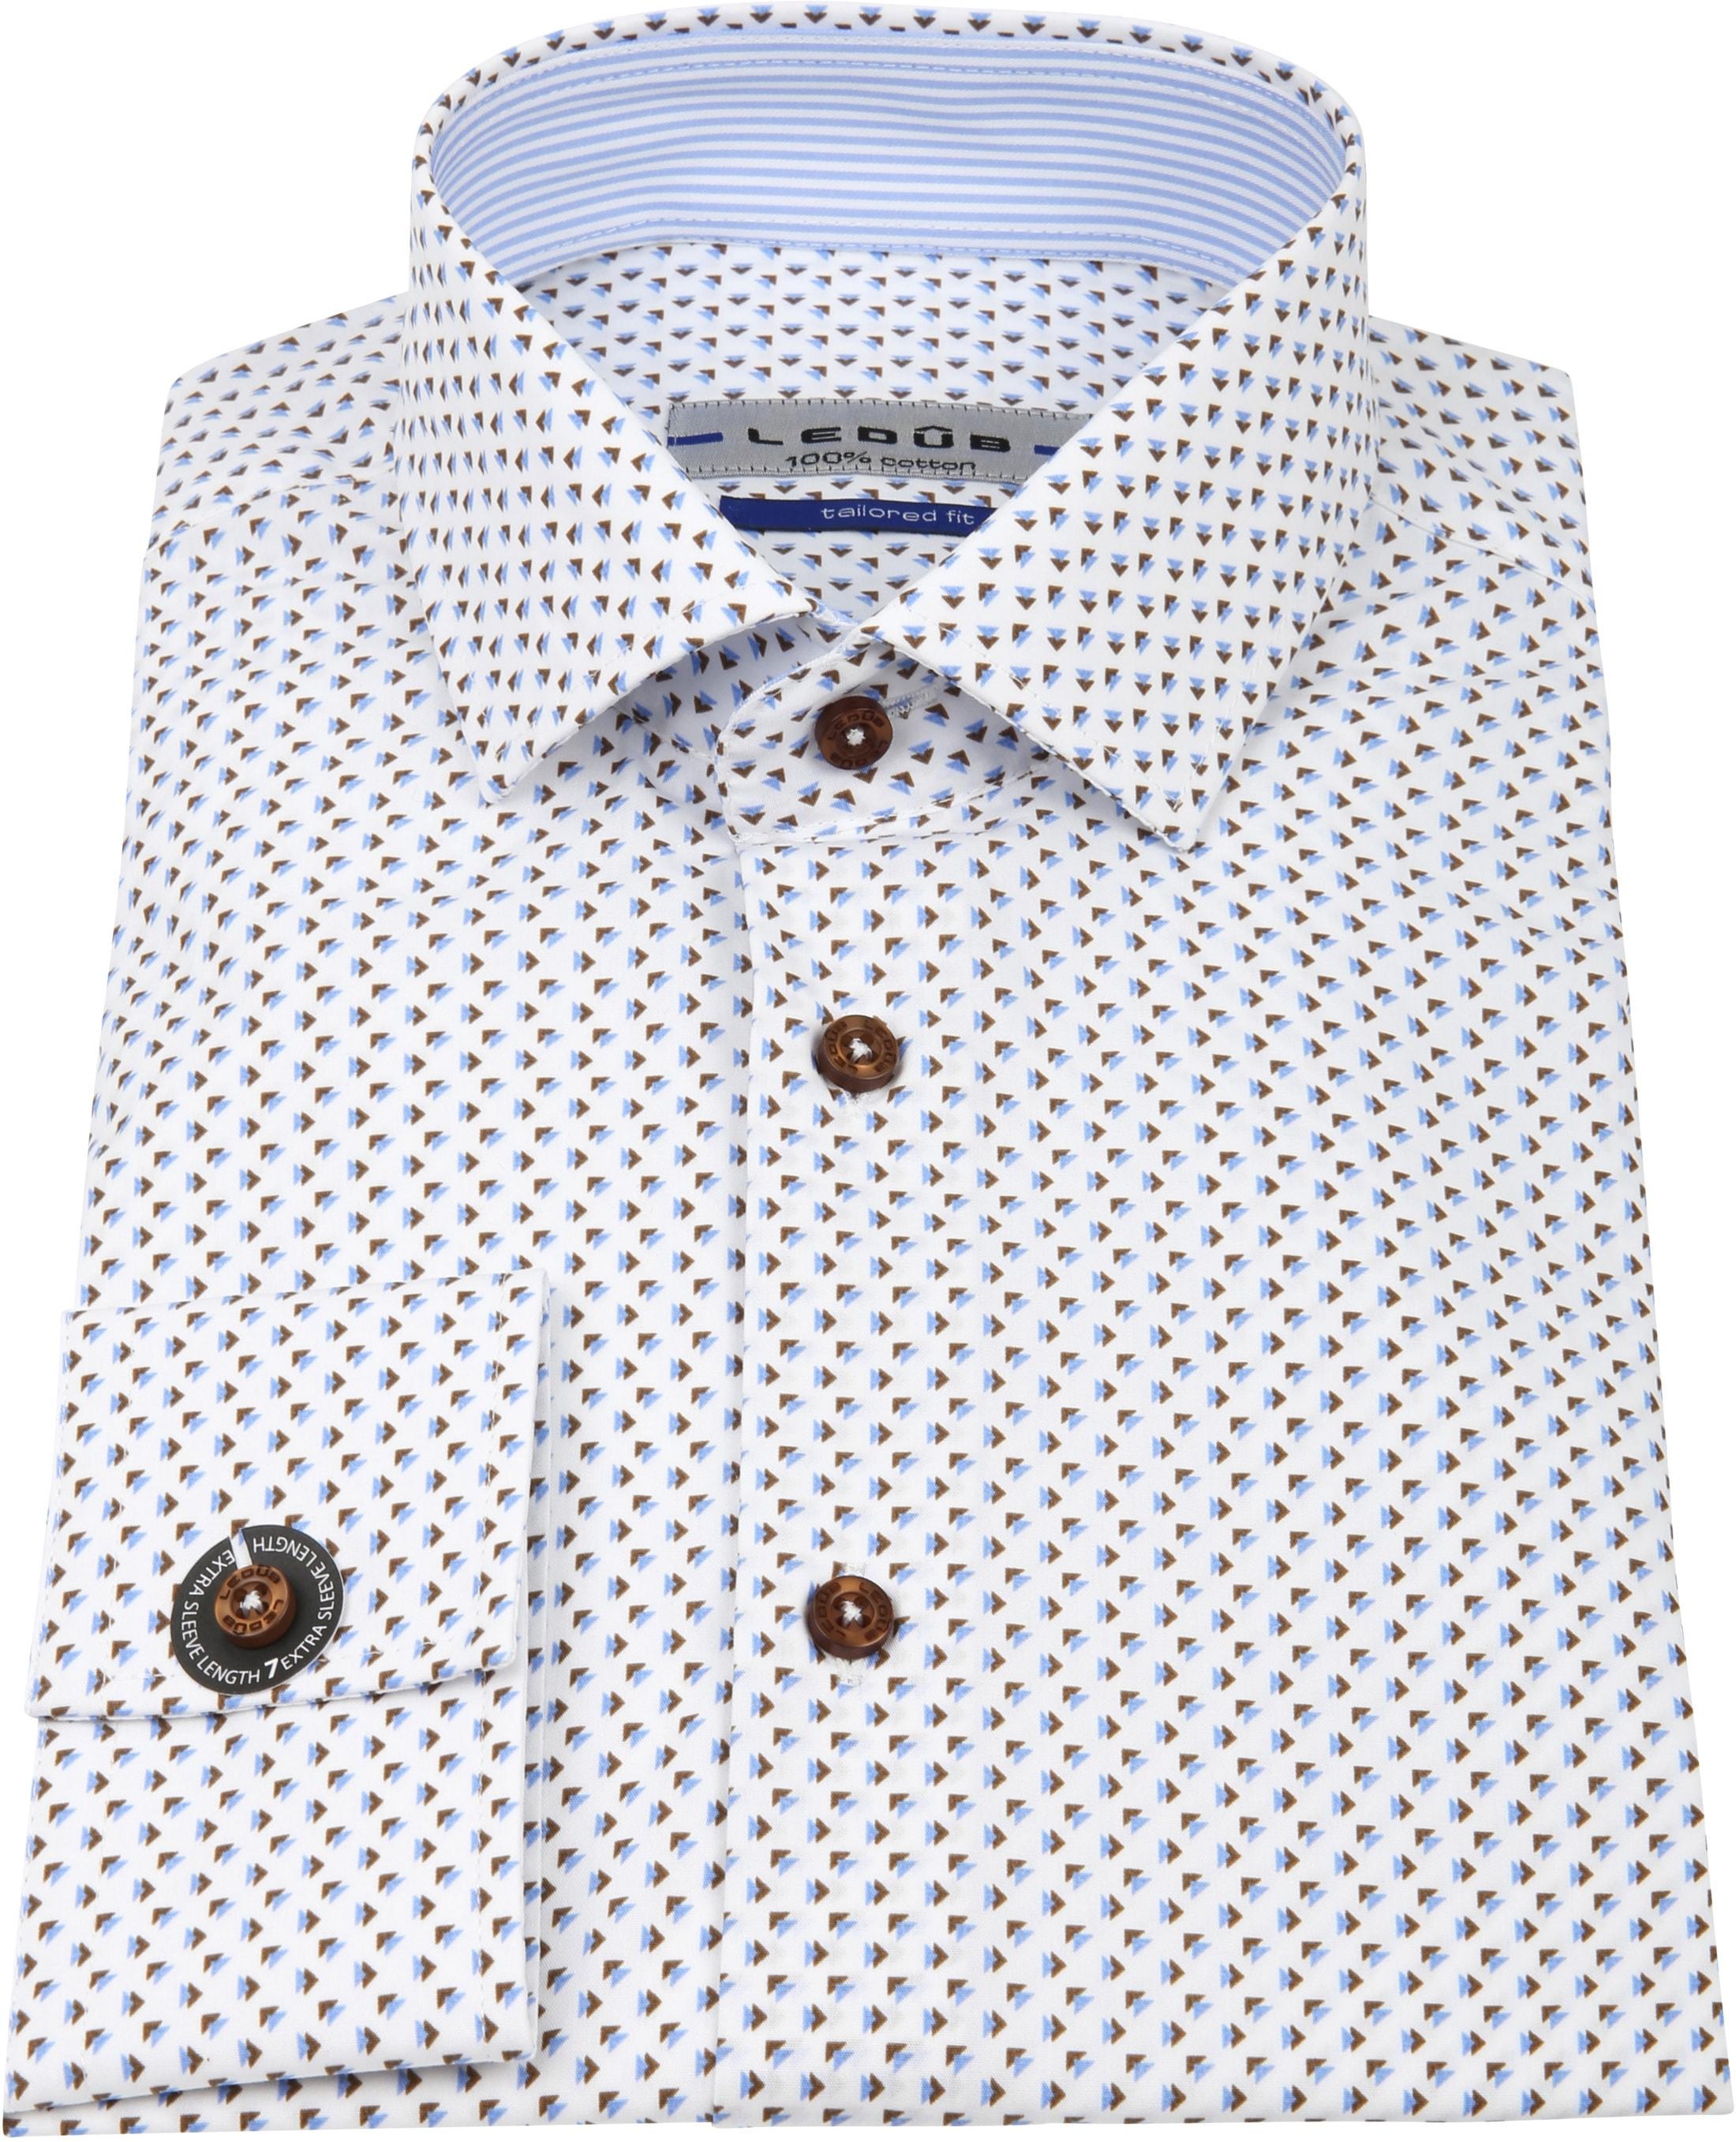 Ledub Overhemd Print Bruin Blauw SL7 foto 3